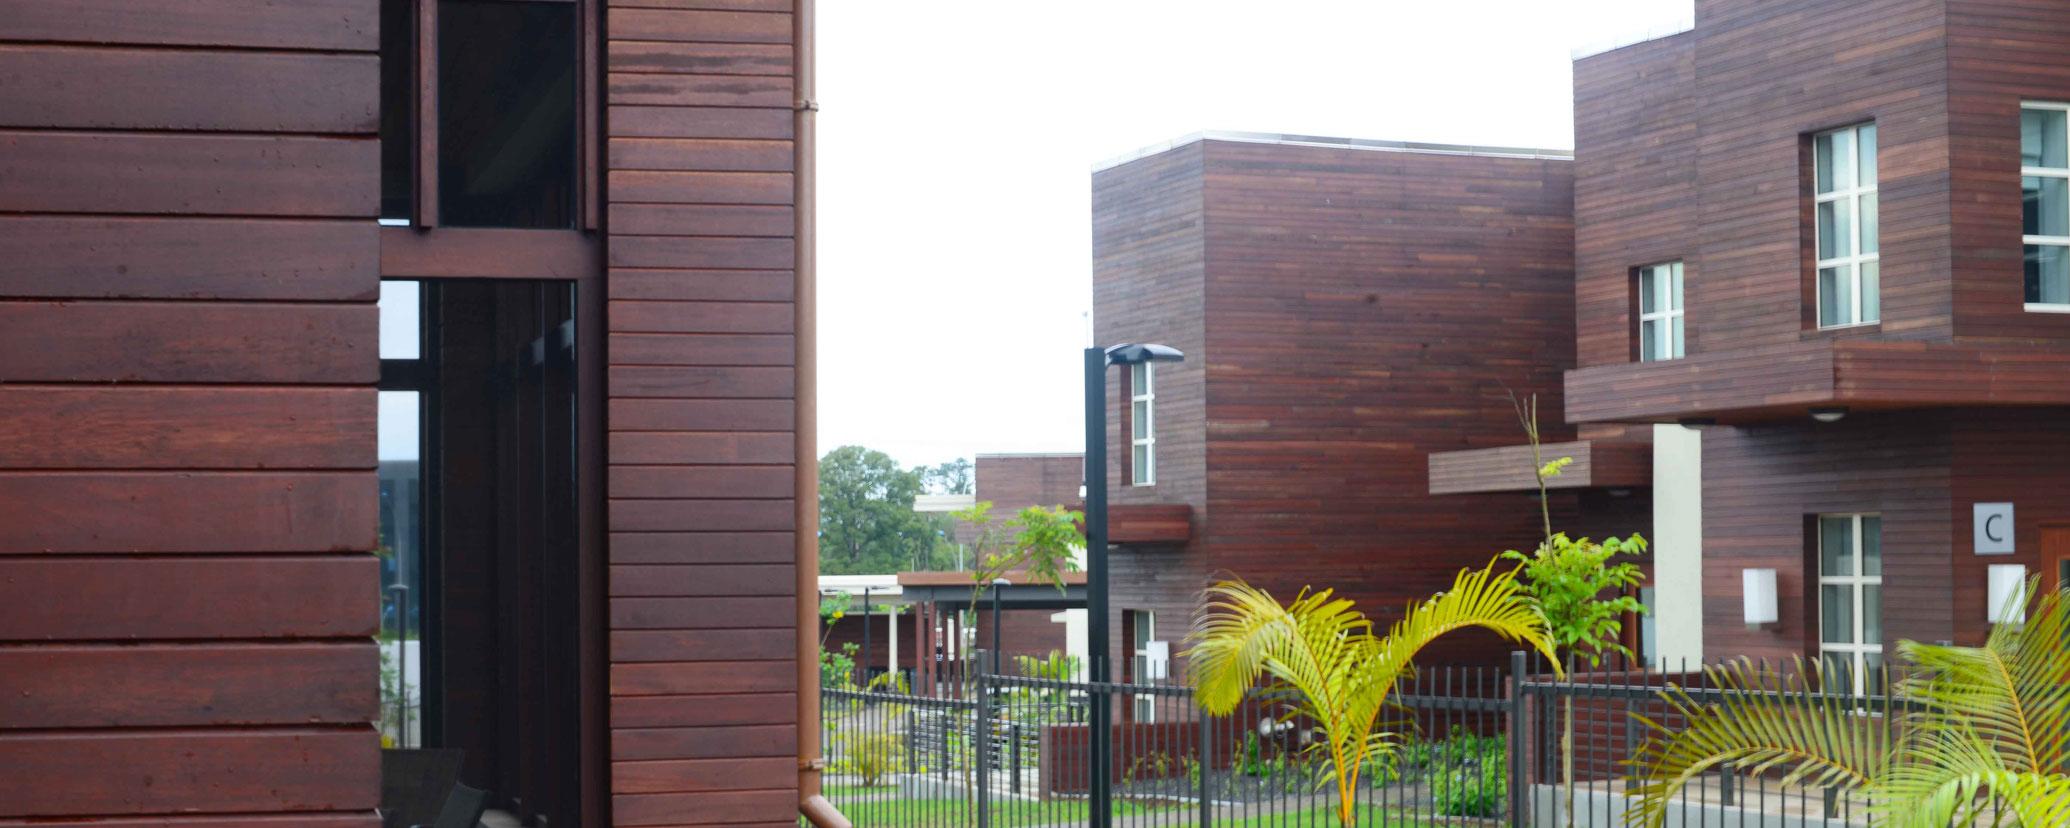 Caddell Construction project - Malabo Apartments Malabo, Equatorial Guinea